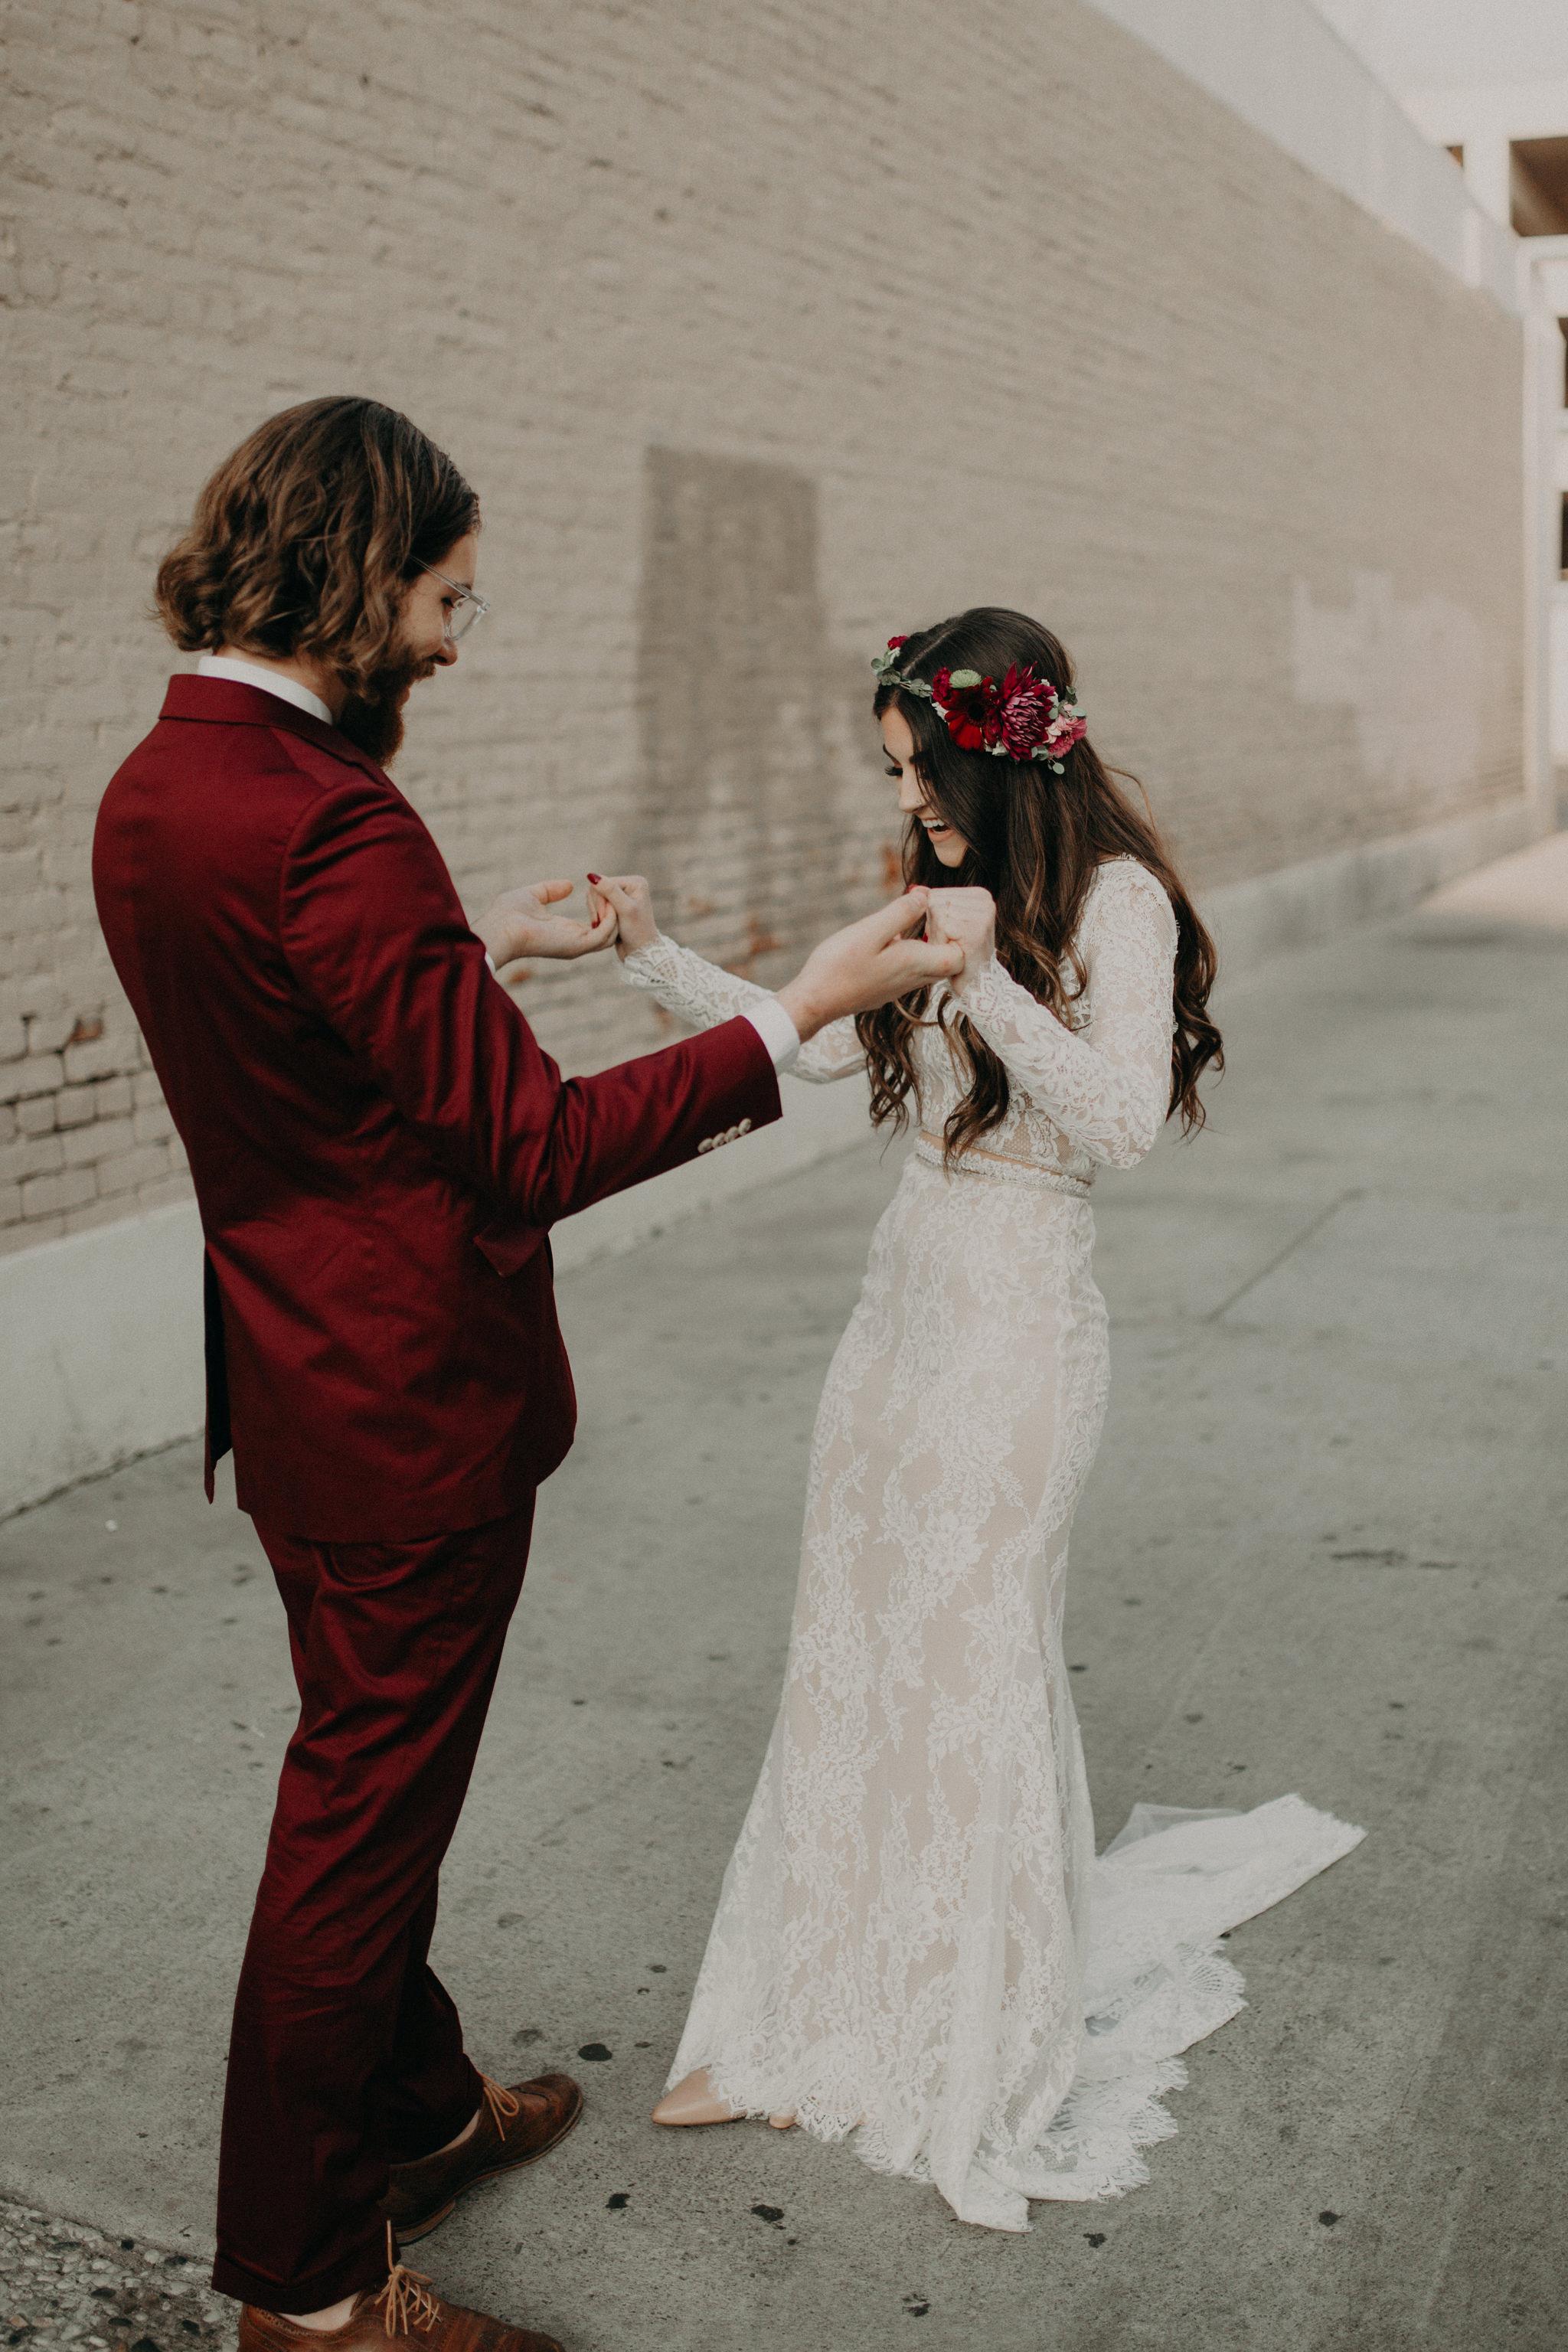 couple-wedding-indie-wedding-northern-california-37.jpg